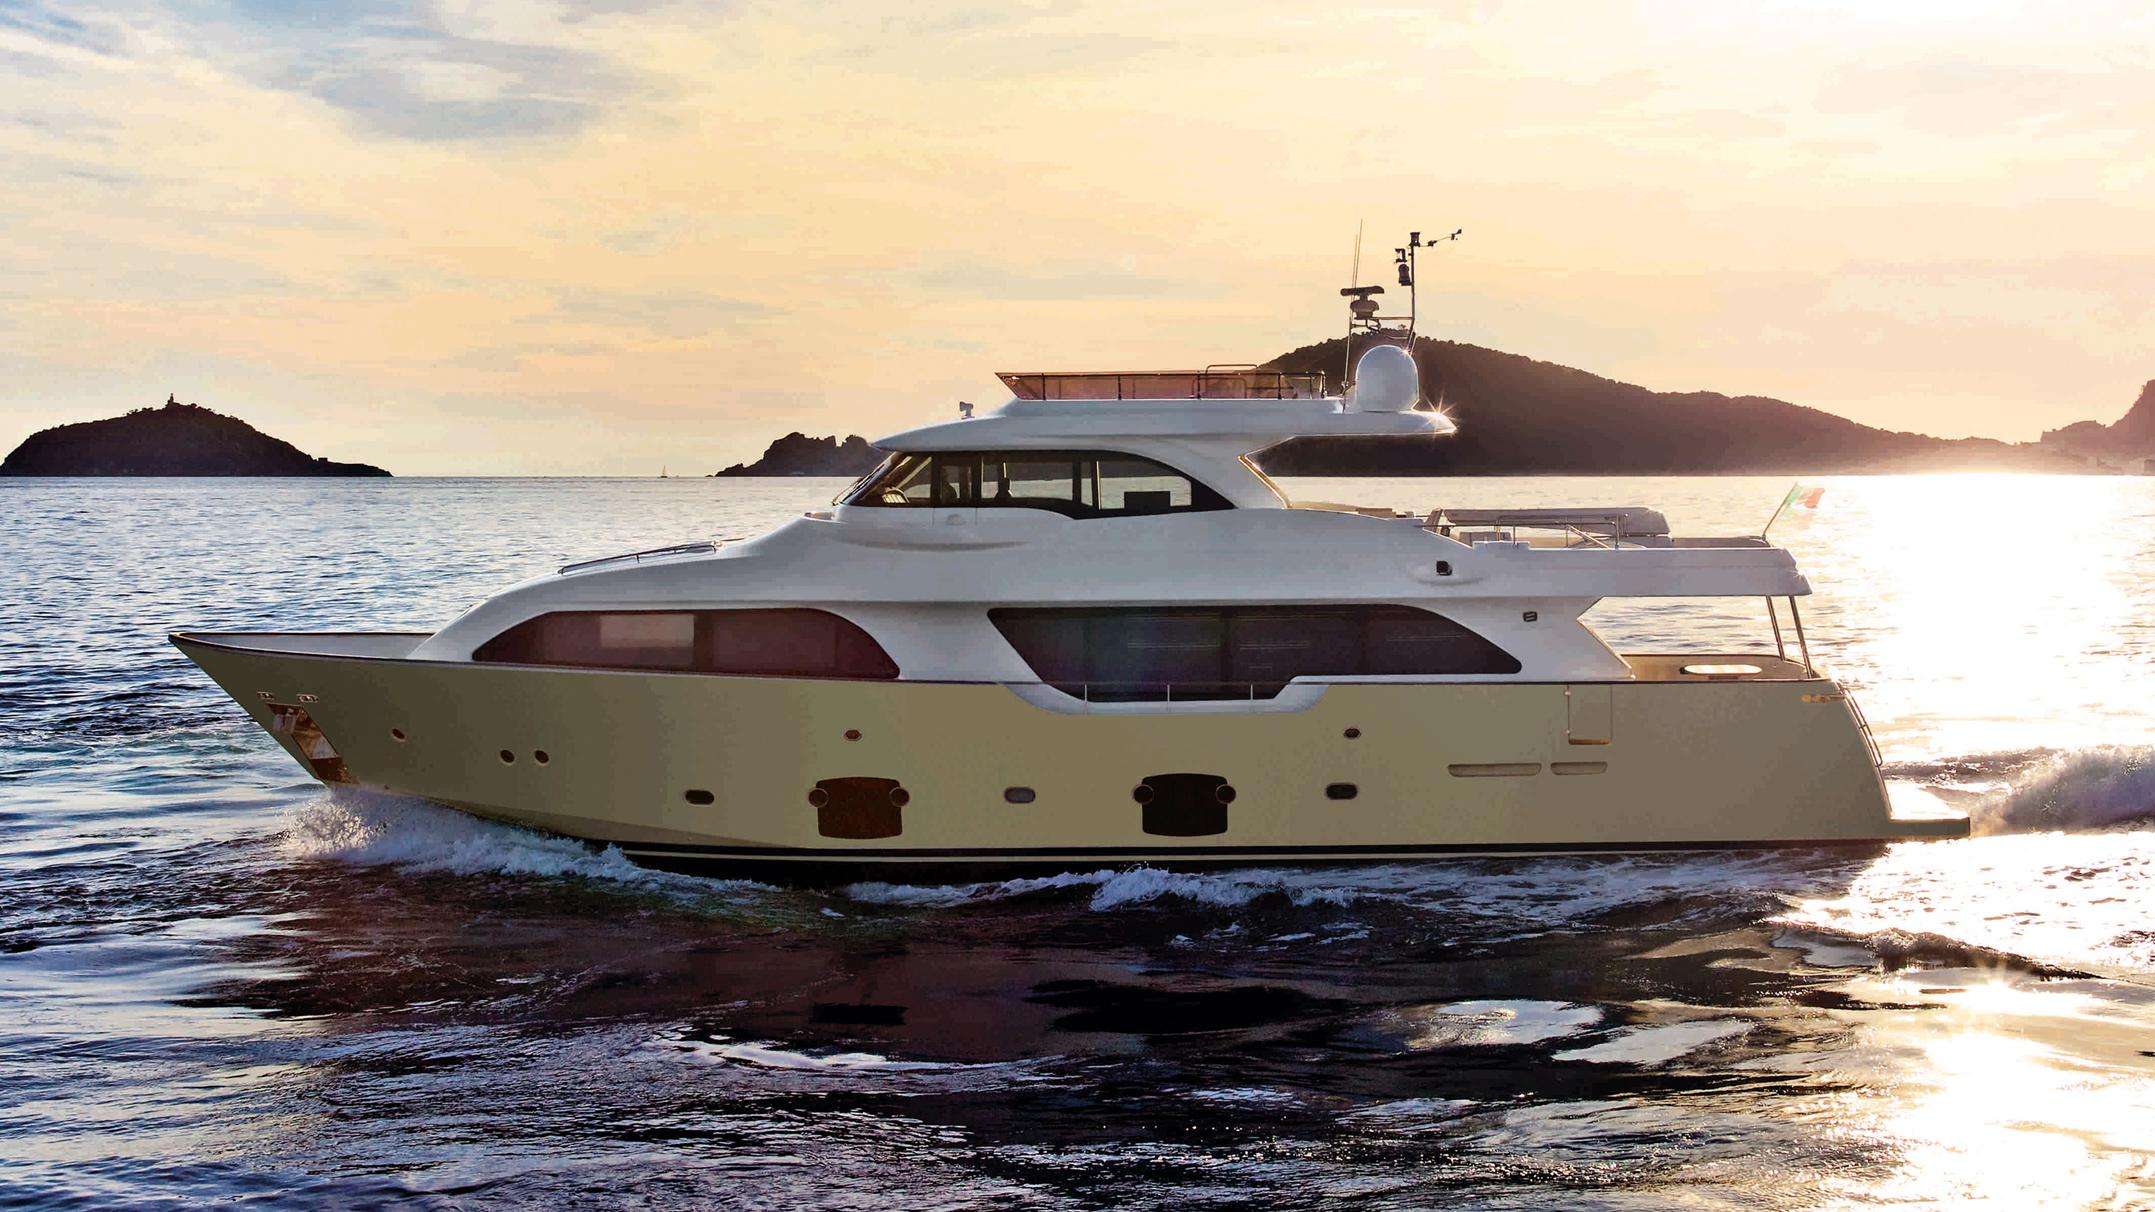 navetta-26c-16-motor-yacht-ferretti-custom-line-2012-profile